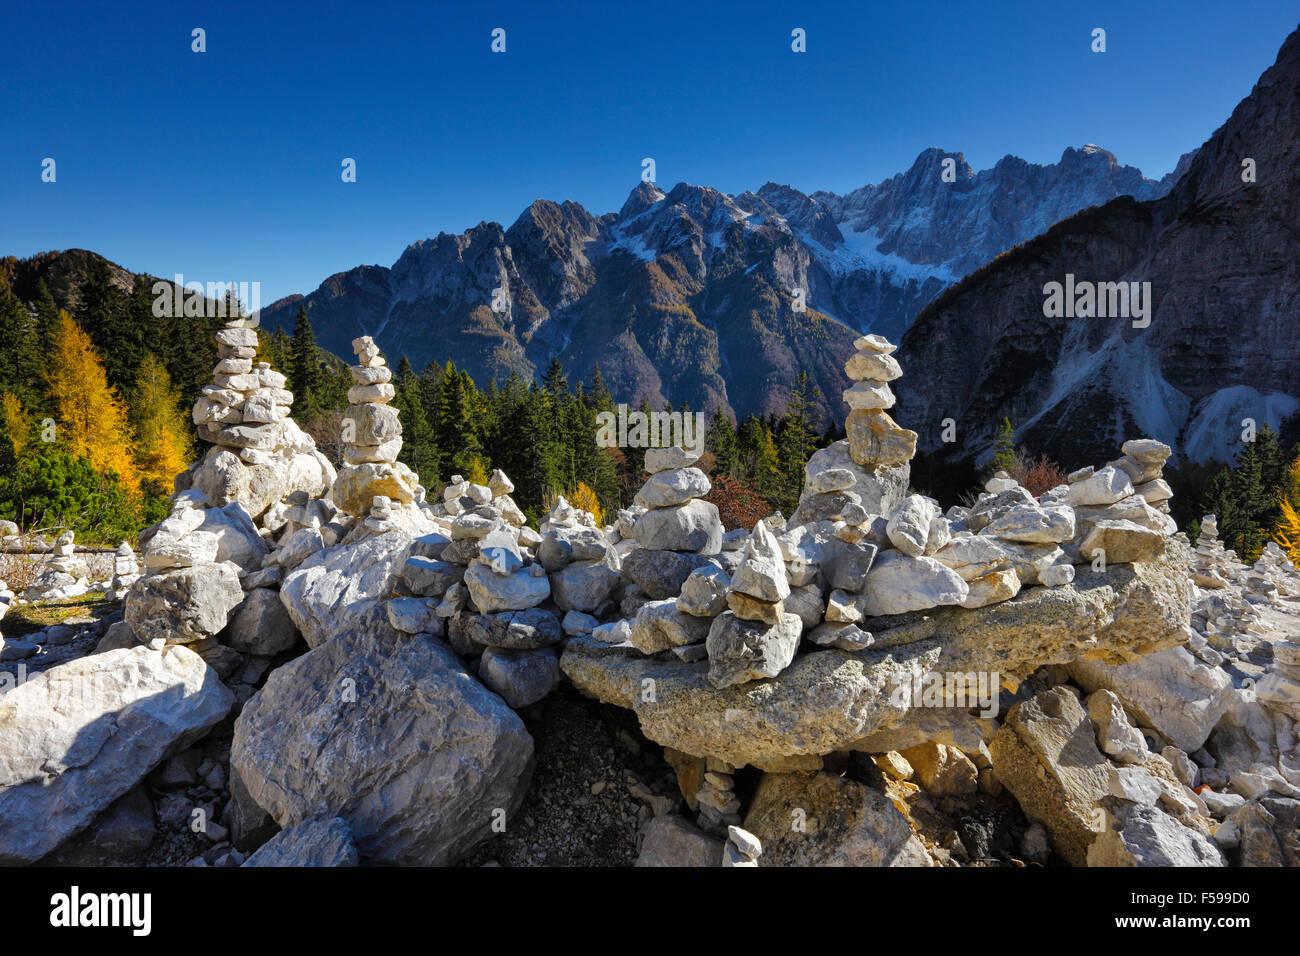 Torres de piedra en Alpes Julianos en Eslovenia, montaña Vrsic Pass Foto de stock